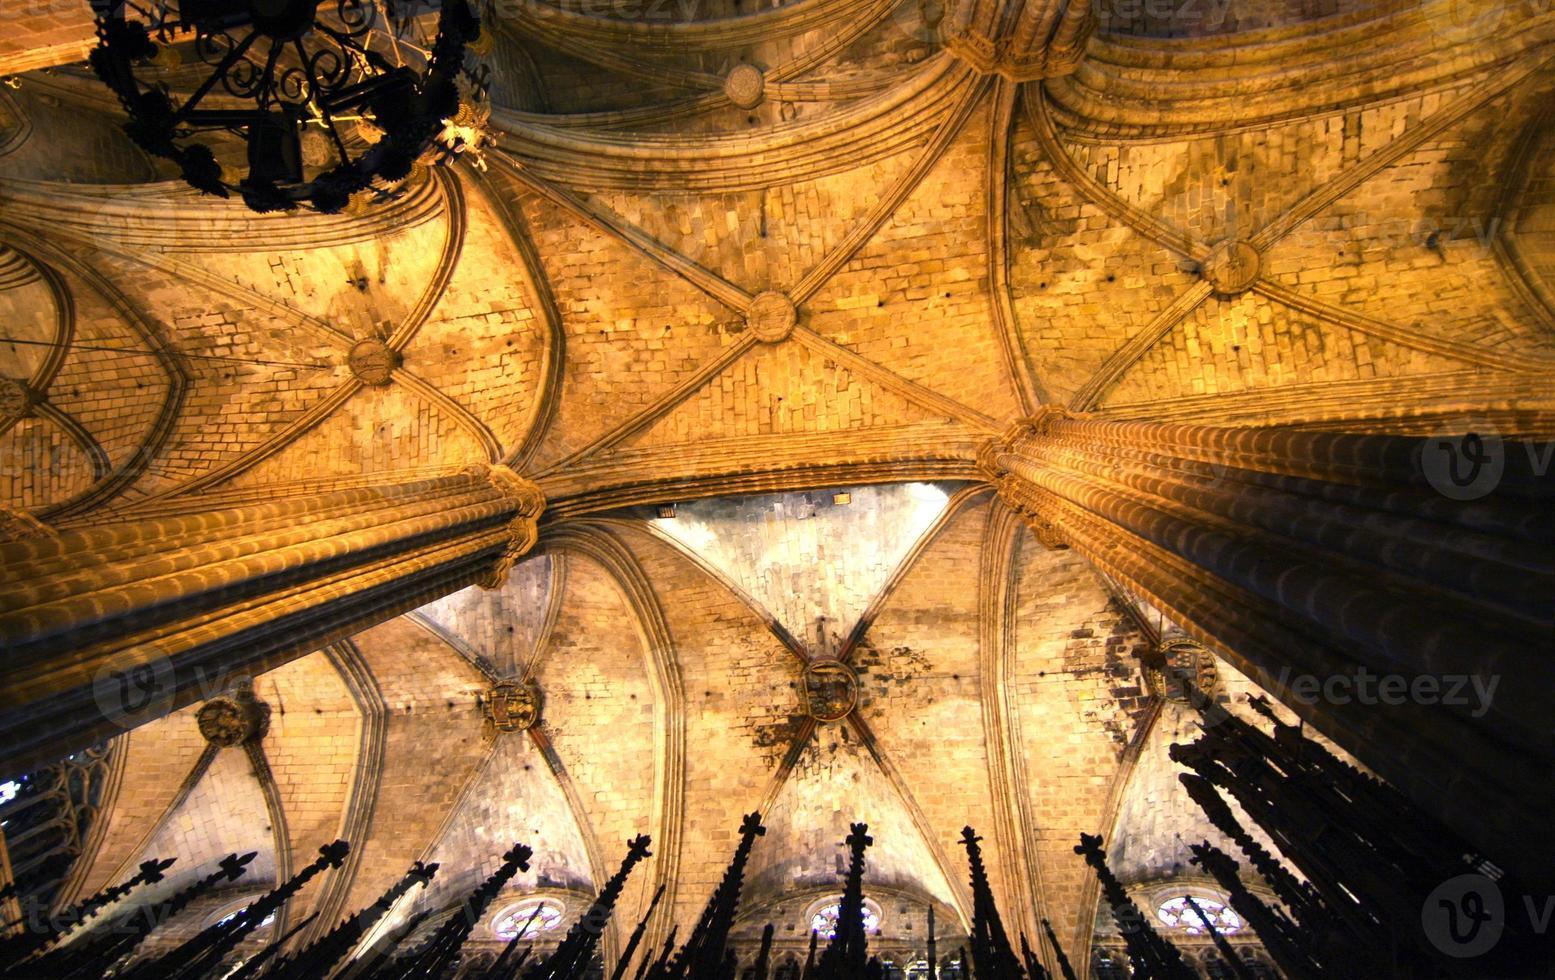 dak. binnenkant van de kathedraal in barcelona foto